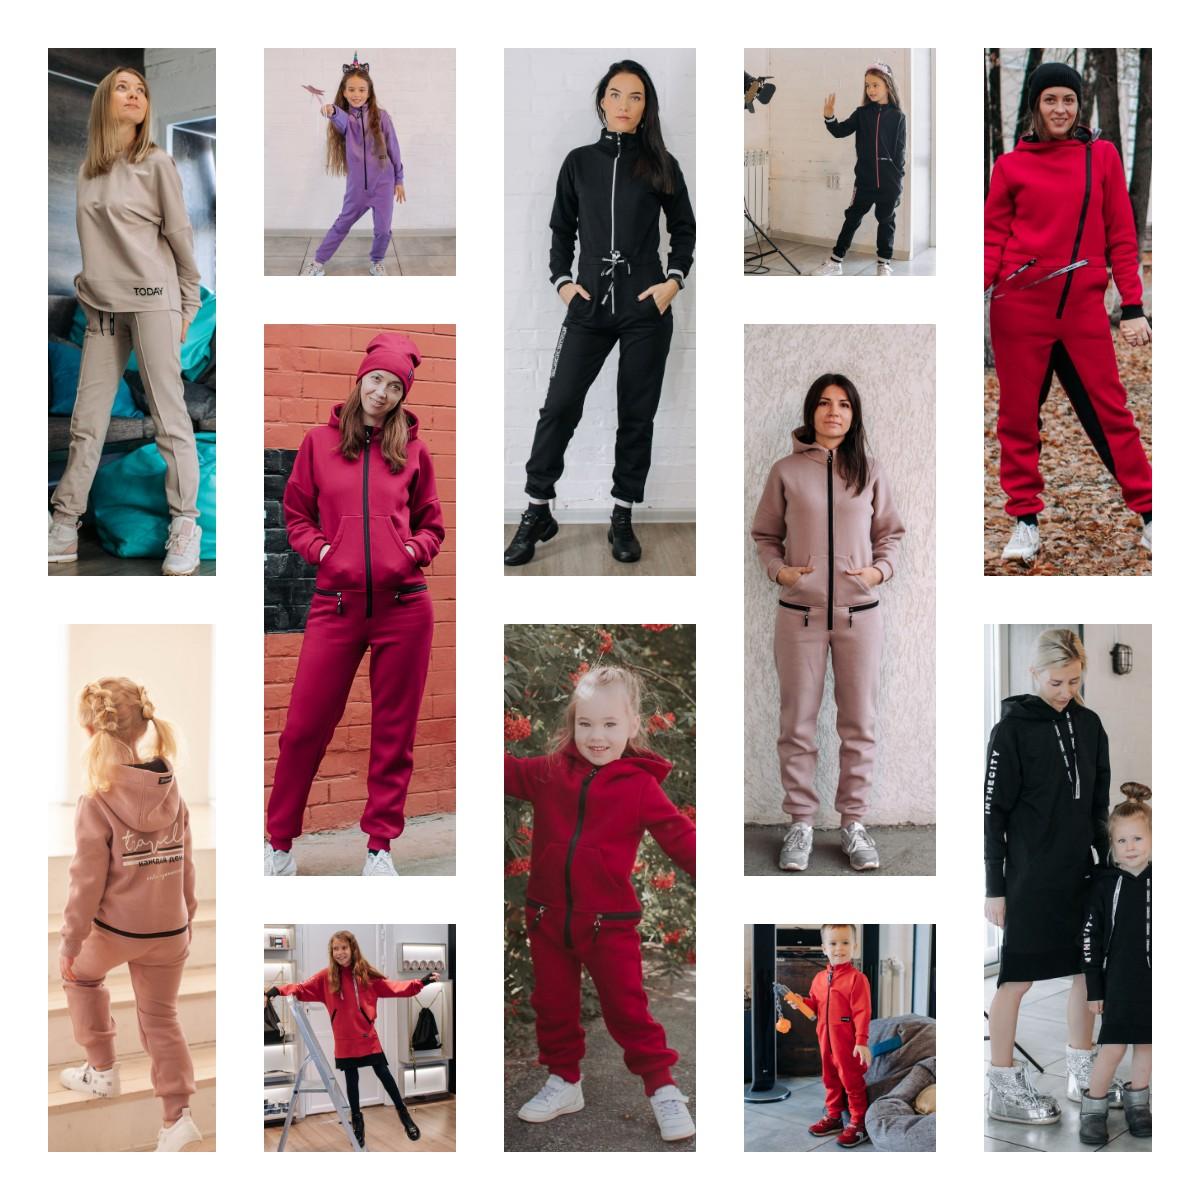 Одежда для всей семьи от бренда INZIBE